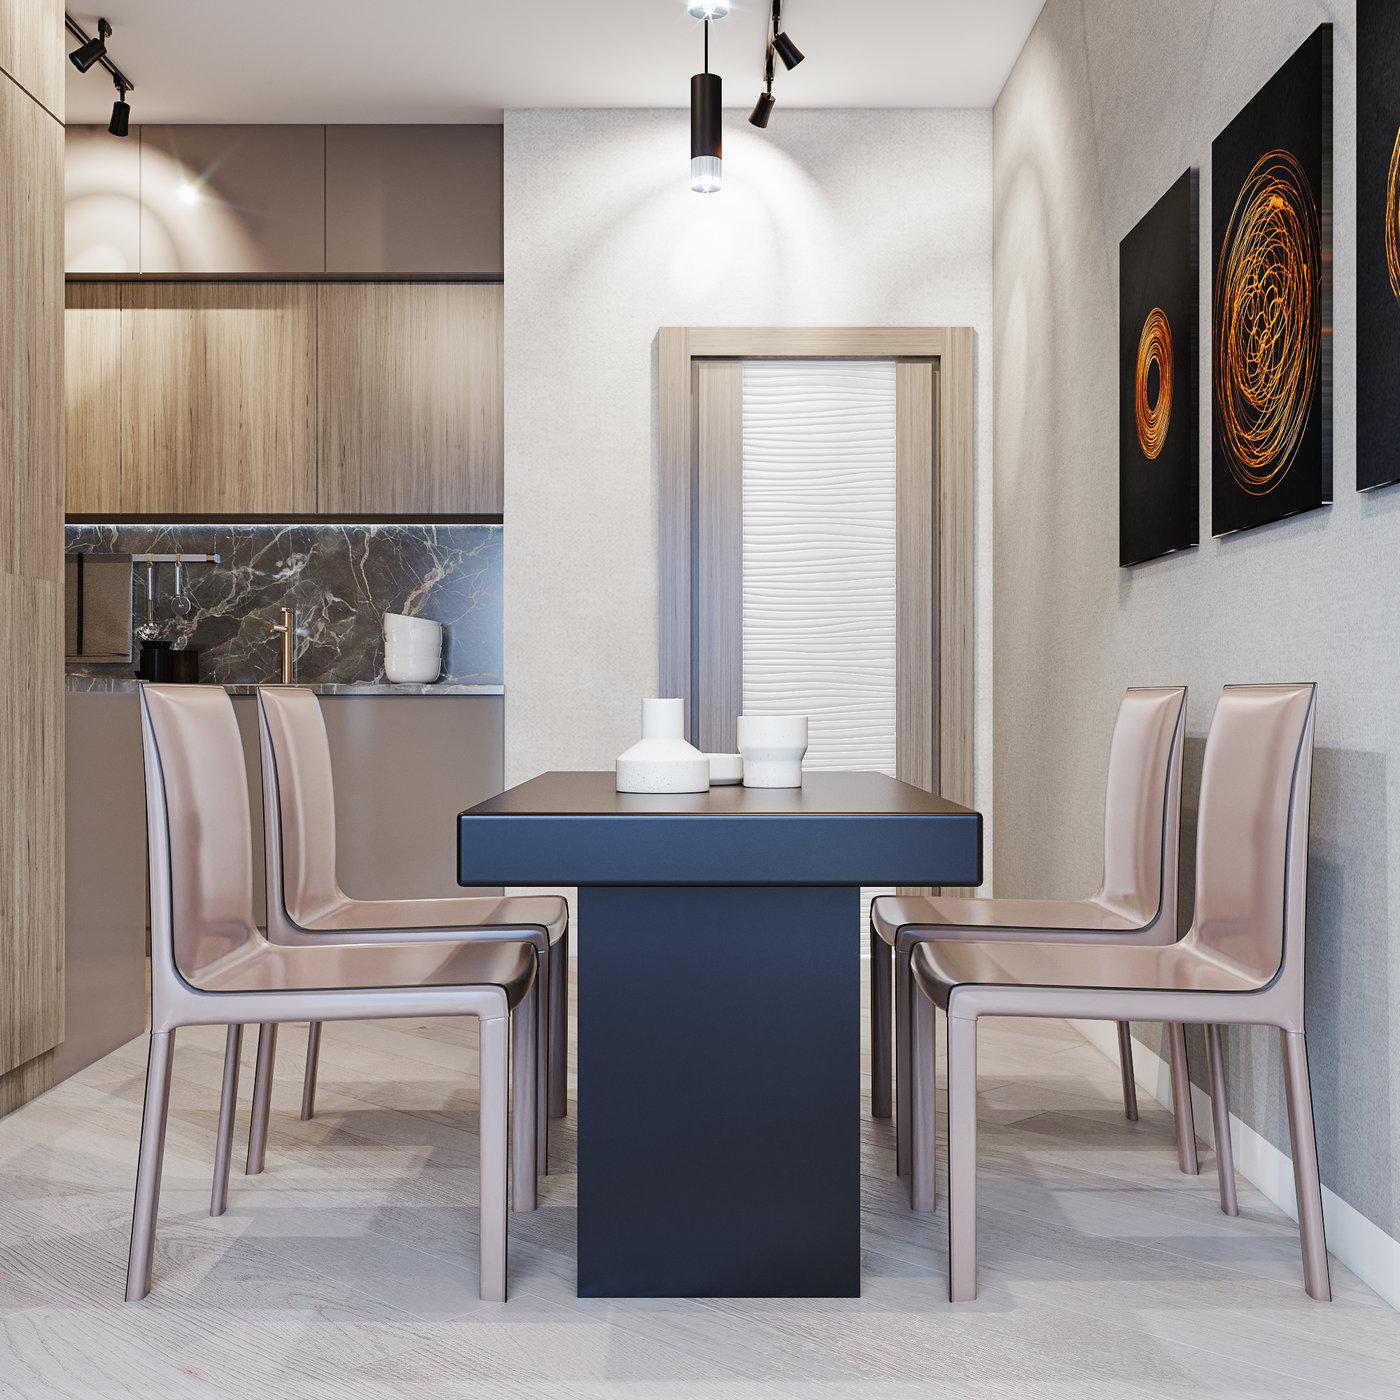 Modern apartment full interior